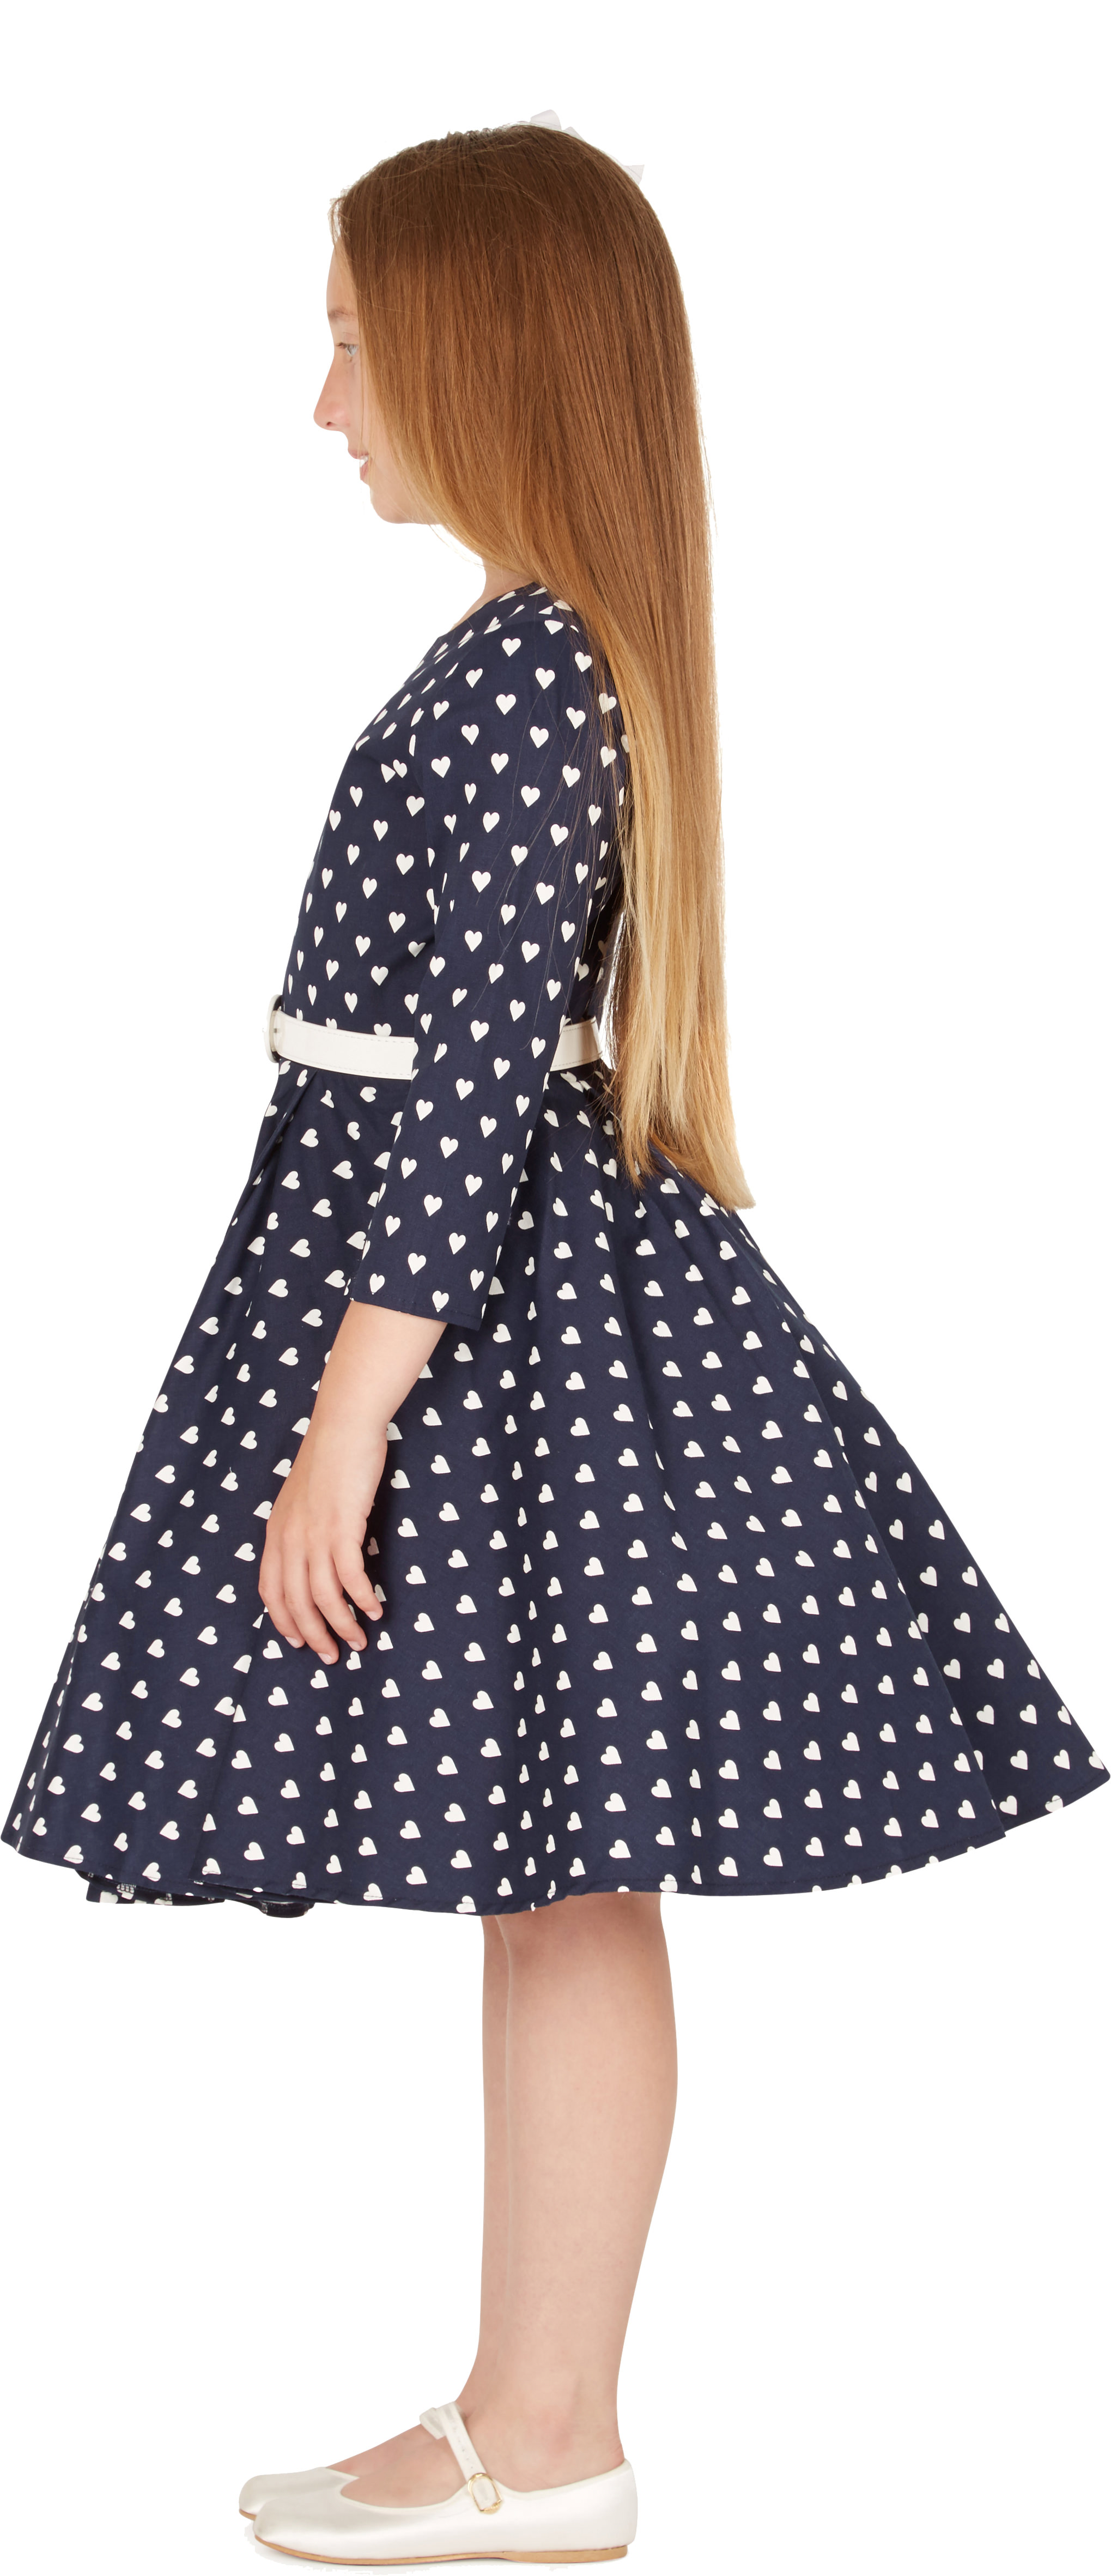 BlackButterfly Kinder \'Chloe\' Vintage Herzen Kleid im 50er-Jahre ...